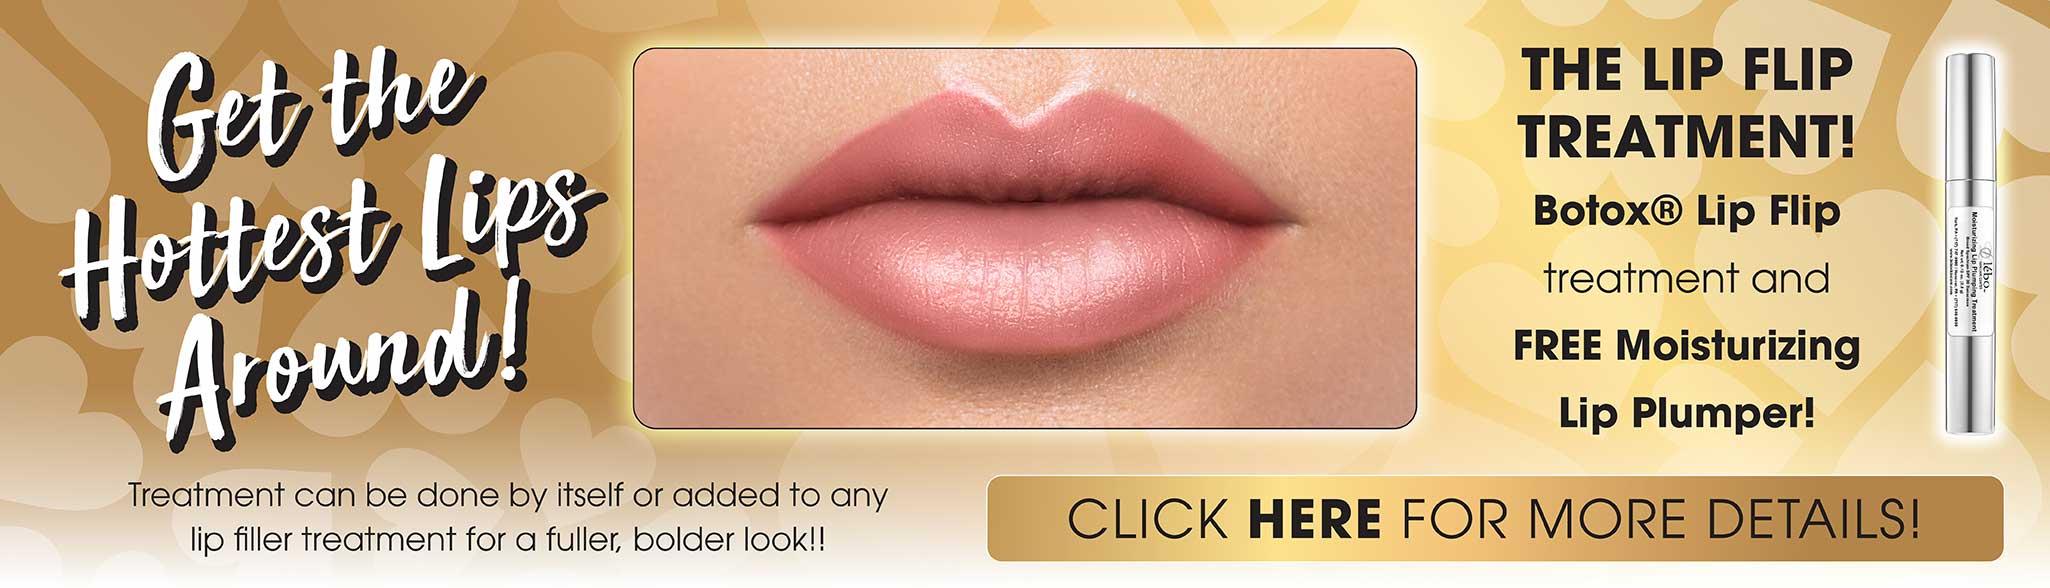 Lip_Plump_WEB_HEAD_052721